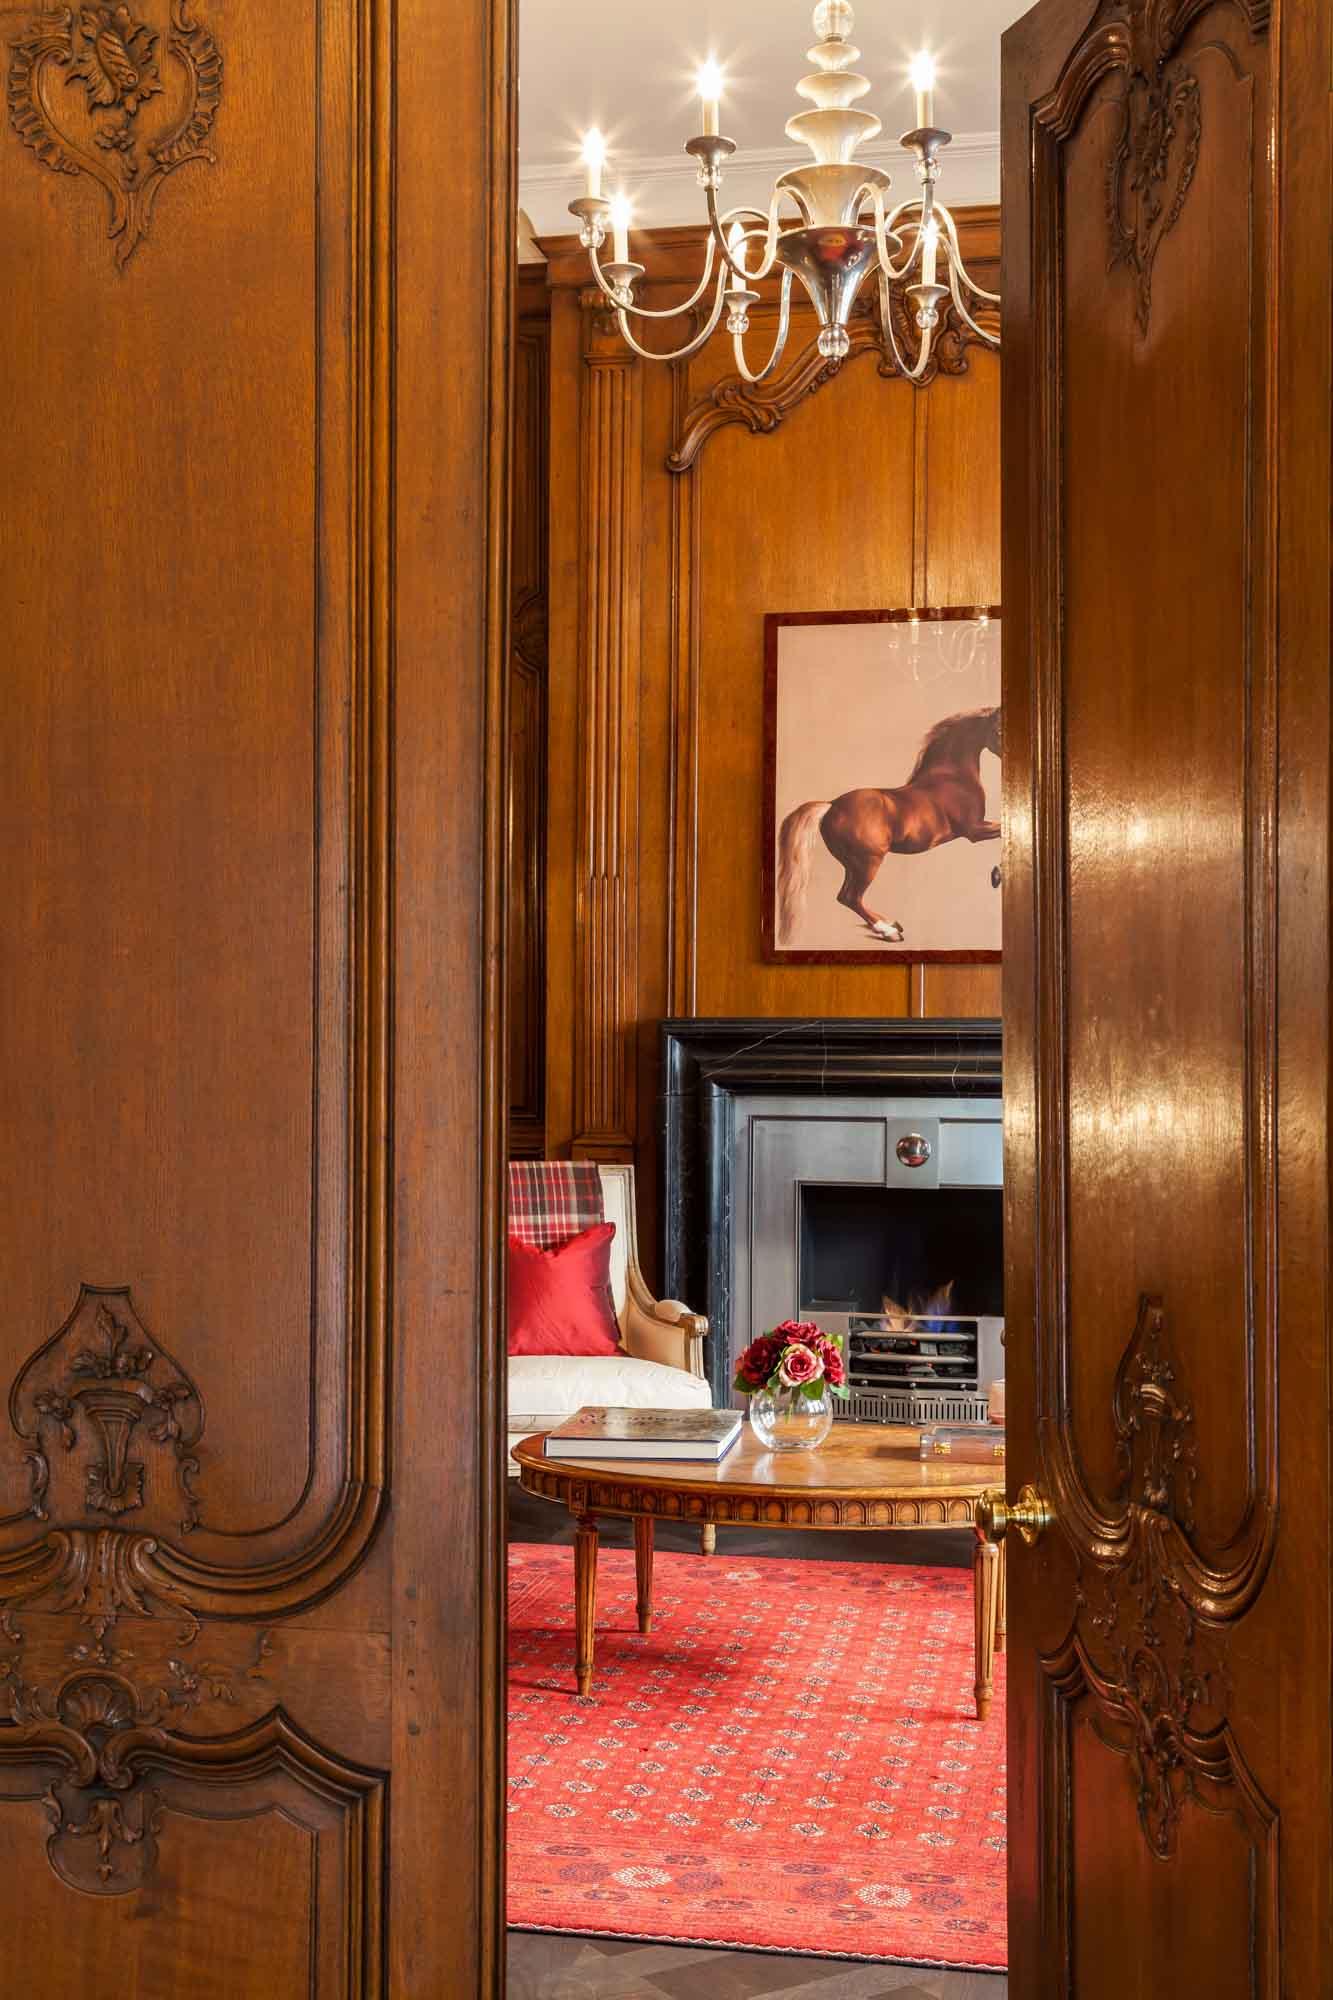 jonathan bond photography, wooden doorway view of living room, hyde park, london